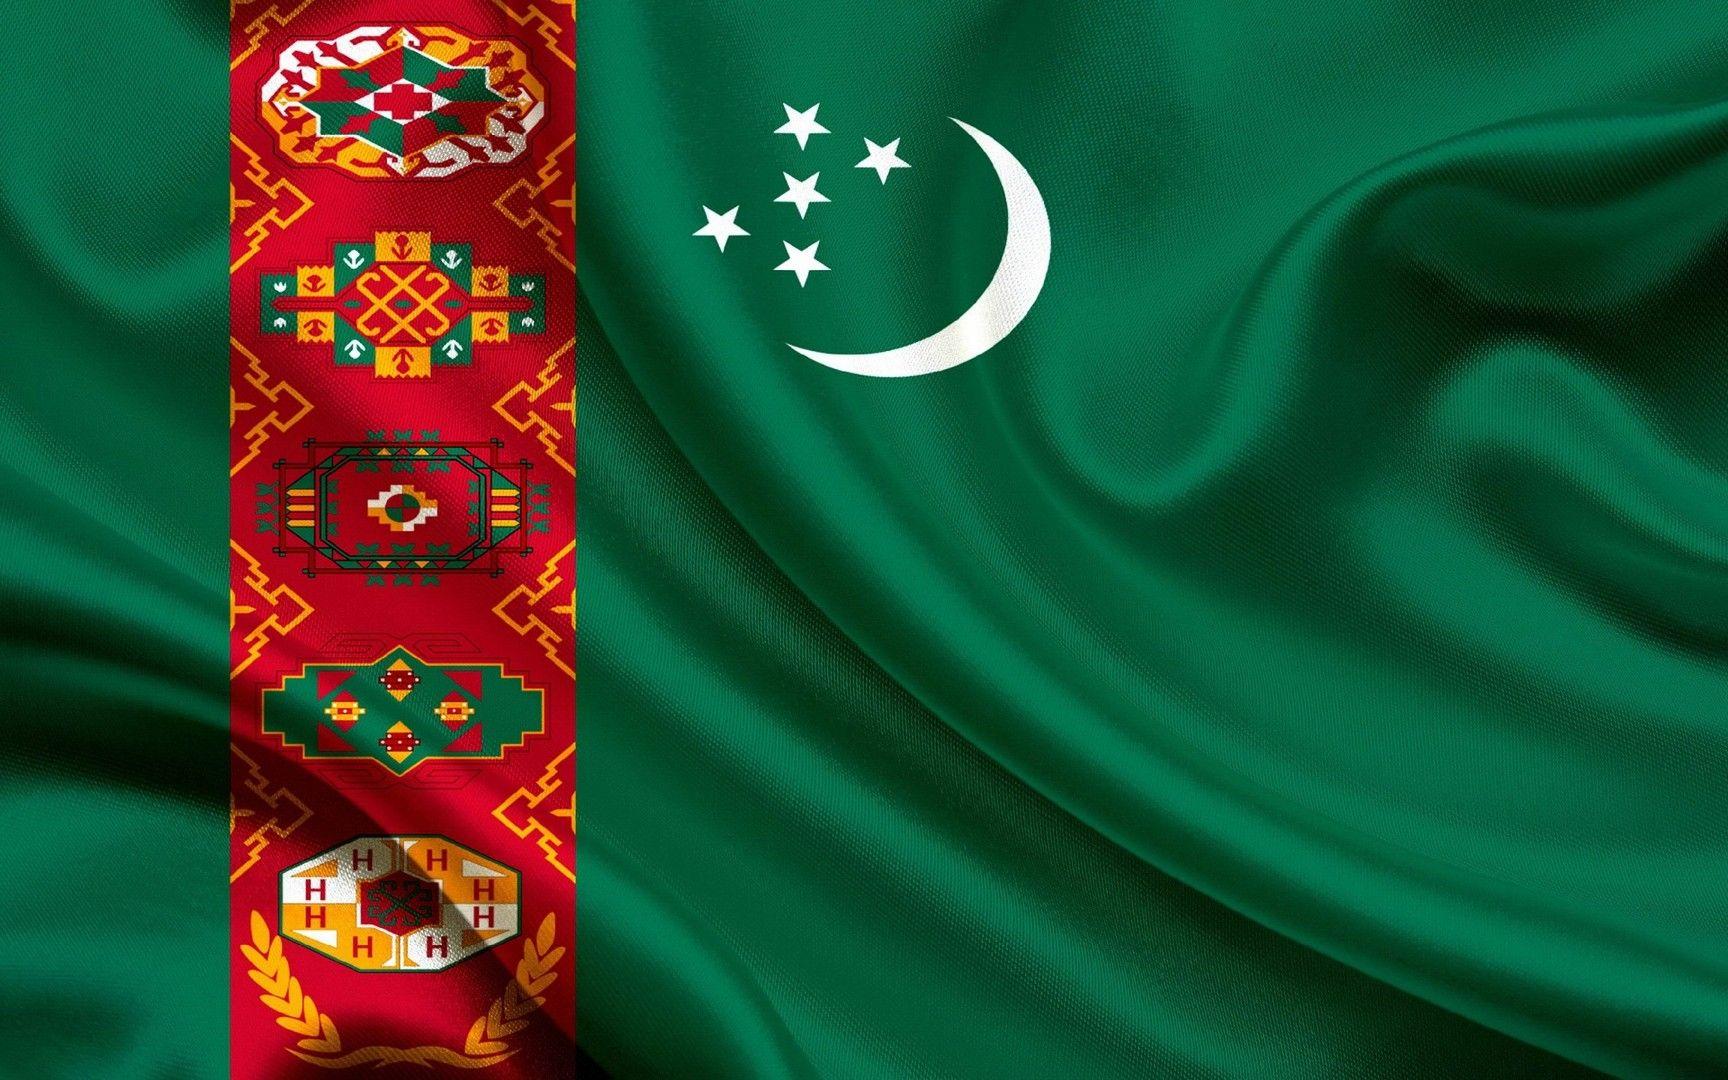 Flag of Turkmenistan wallpaper Education Flag Wallpaper Hd 1728x1080